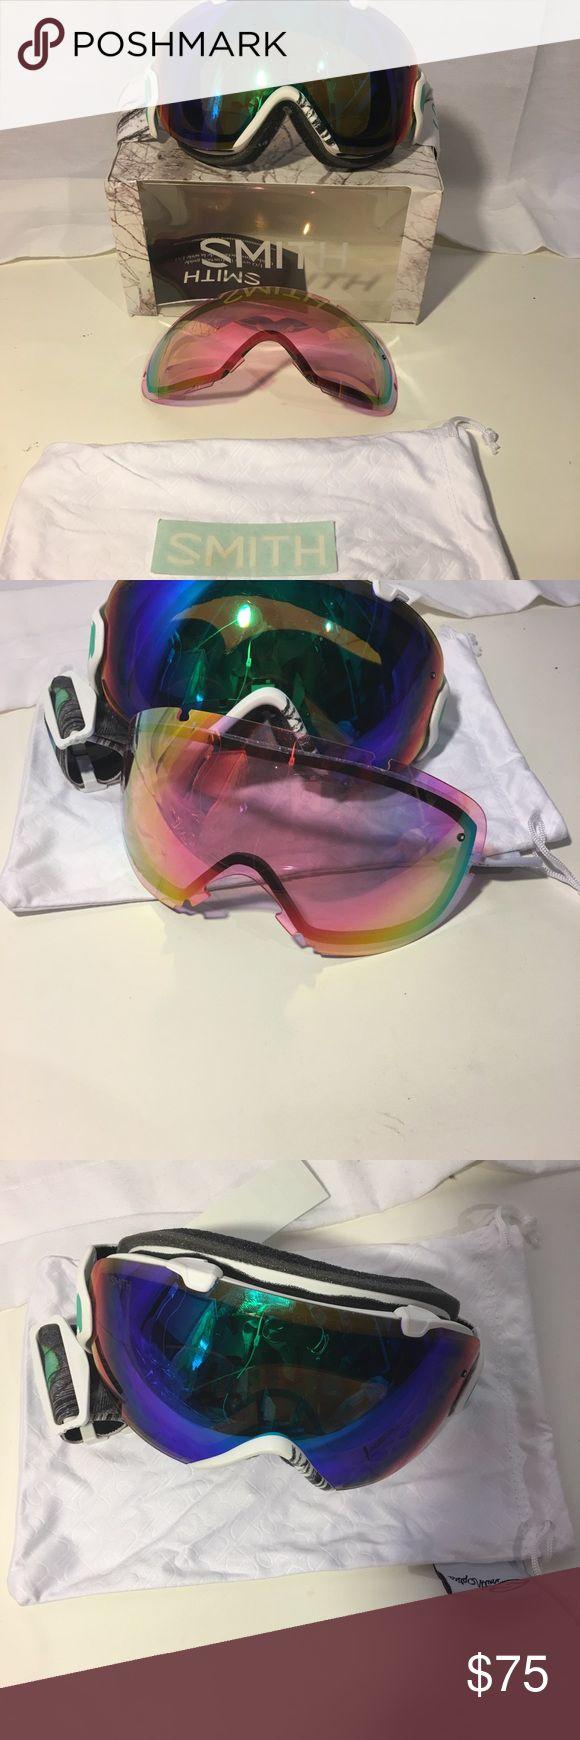 Smith ski goggl Smith ski goggle smith goggles Other